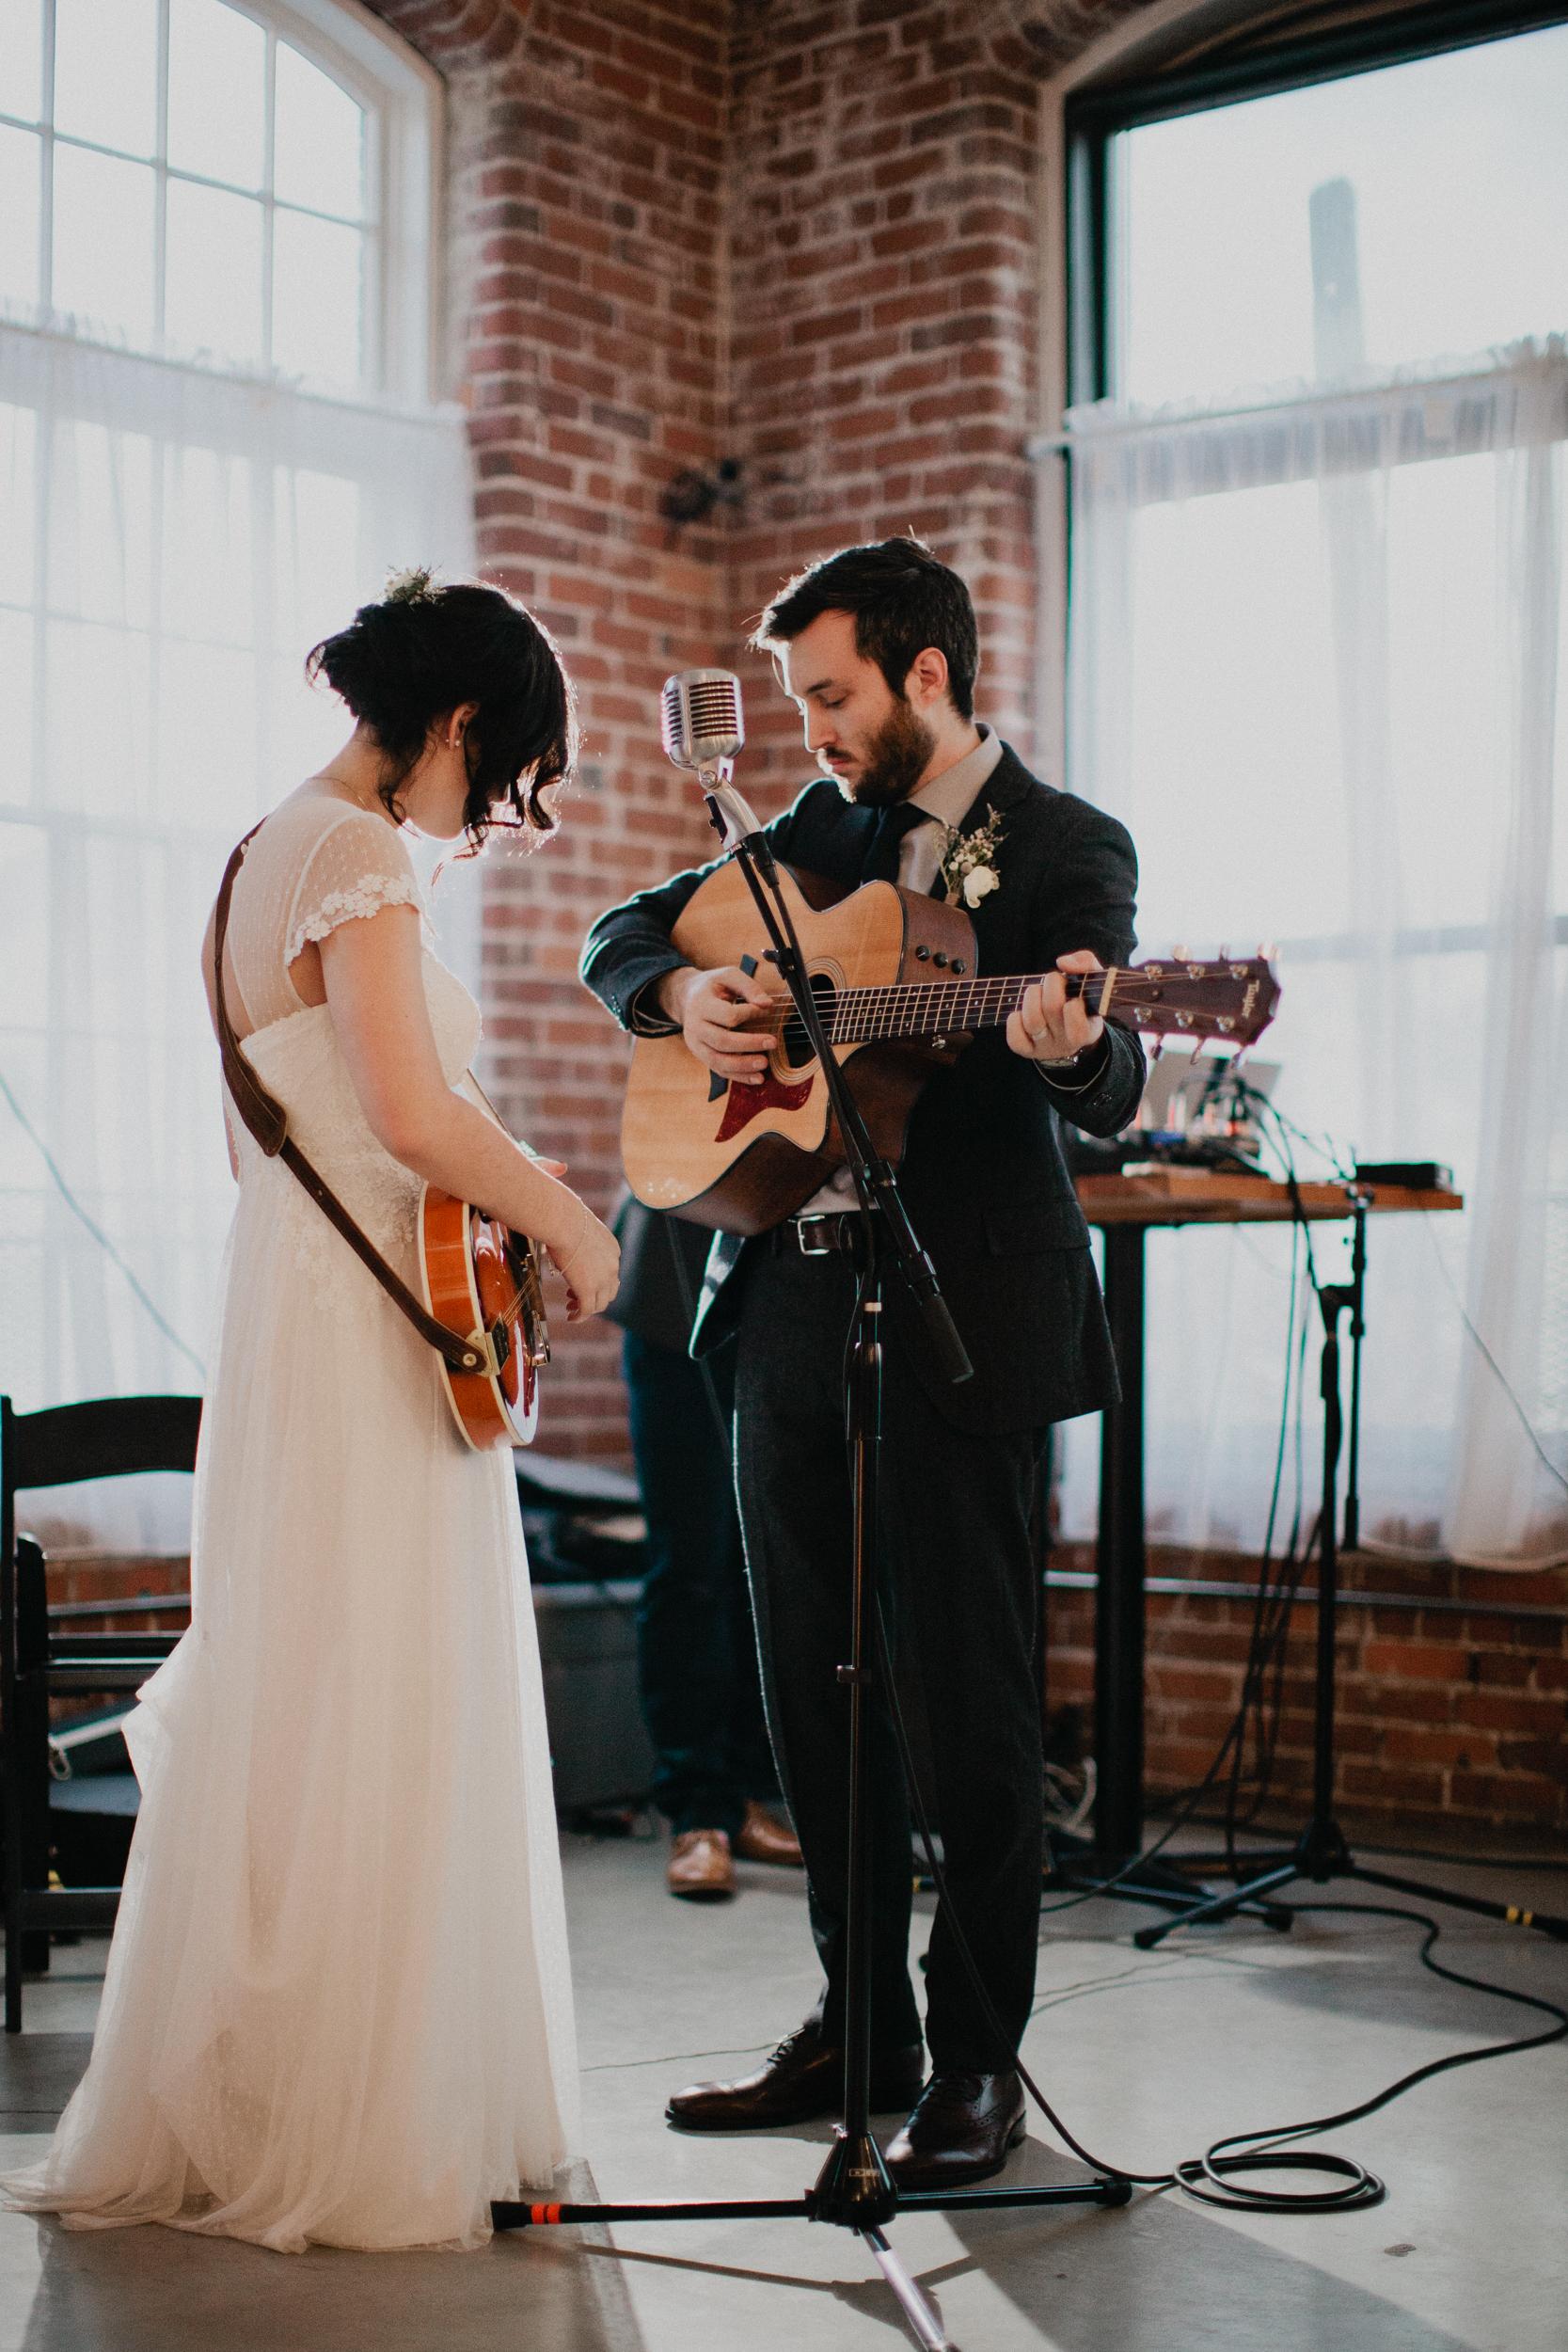 Best-Maine-Wedding-Photographer-1280.jpg